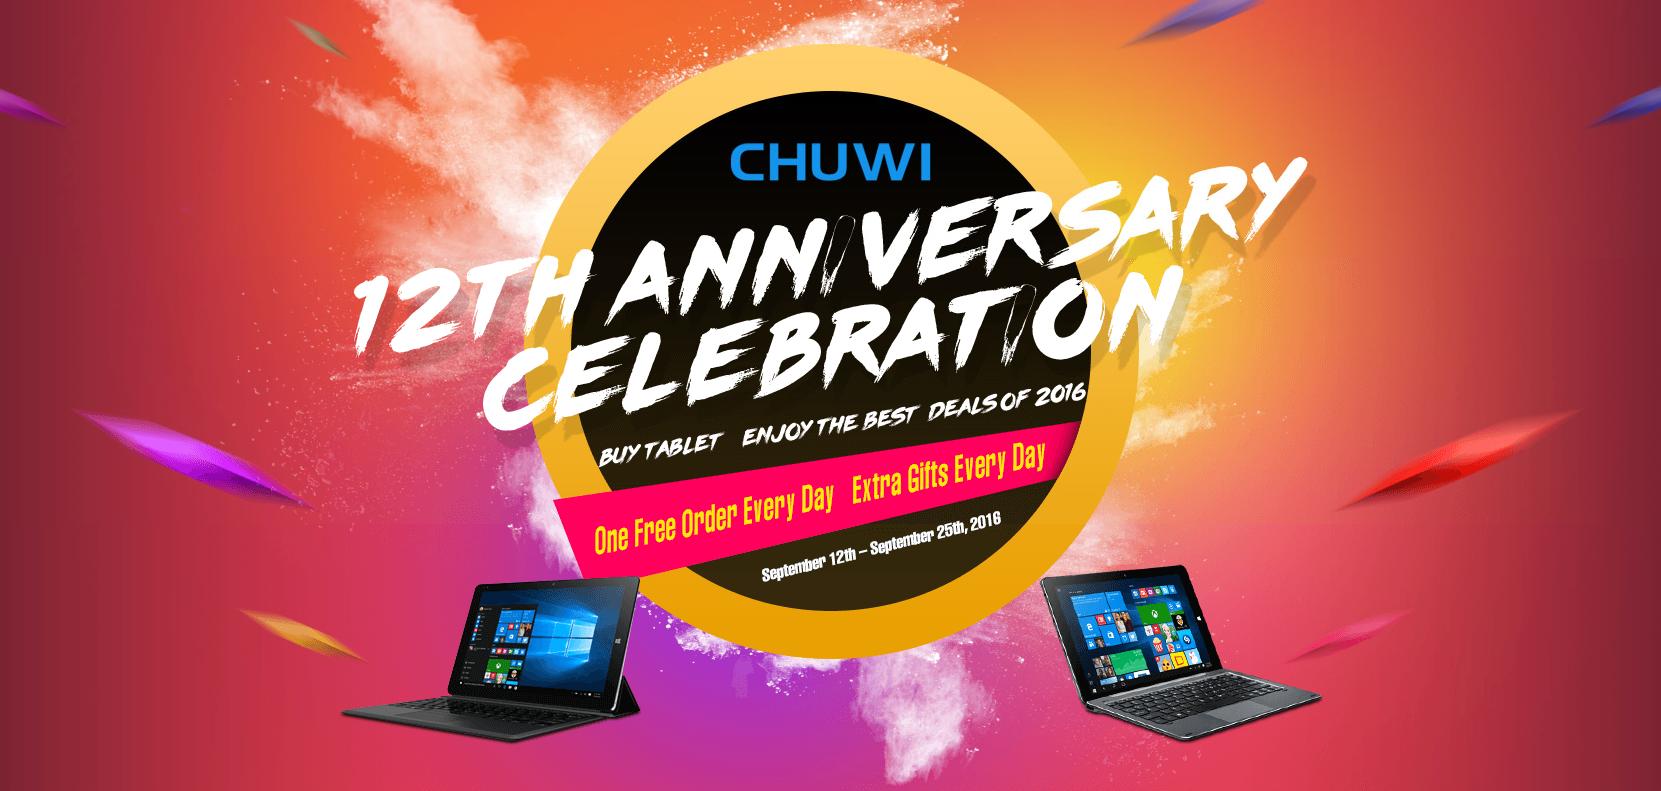 Chuwi tablety s Windows 10 a Androidem zároveň nyní v akci [sponzorovaný článek]